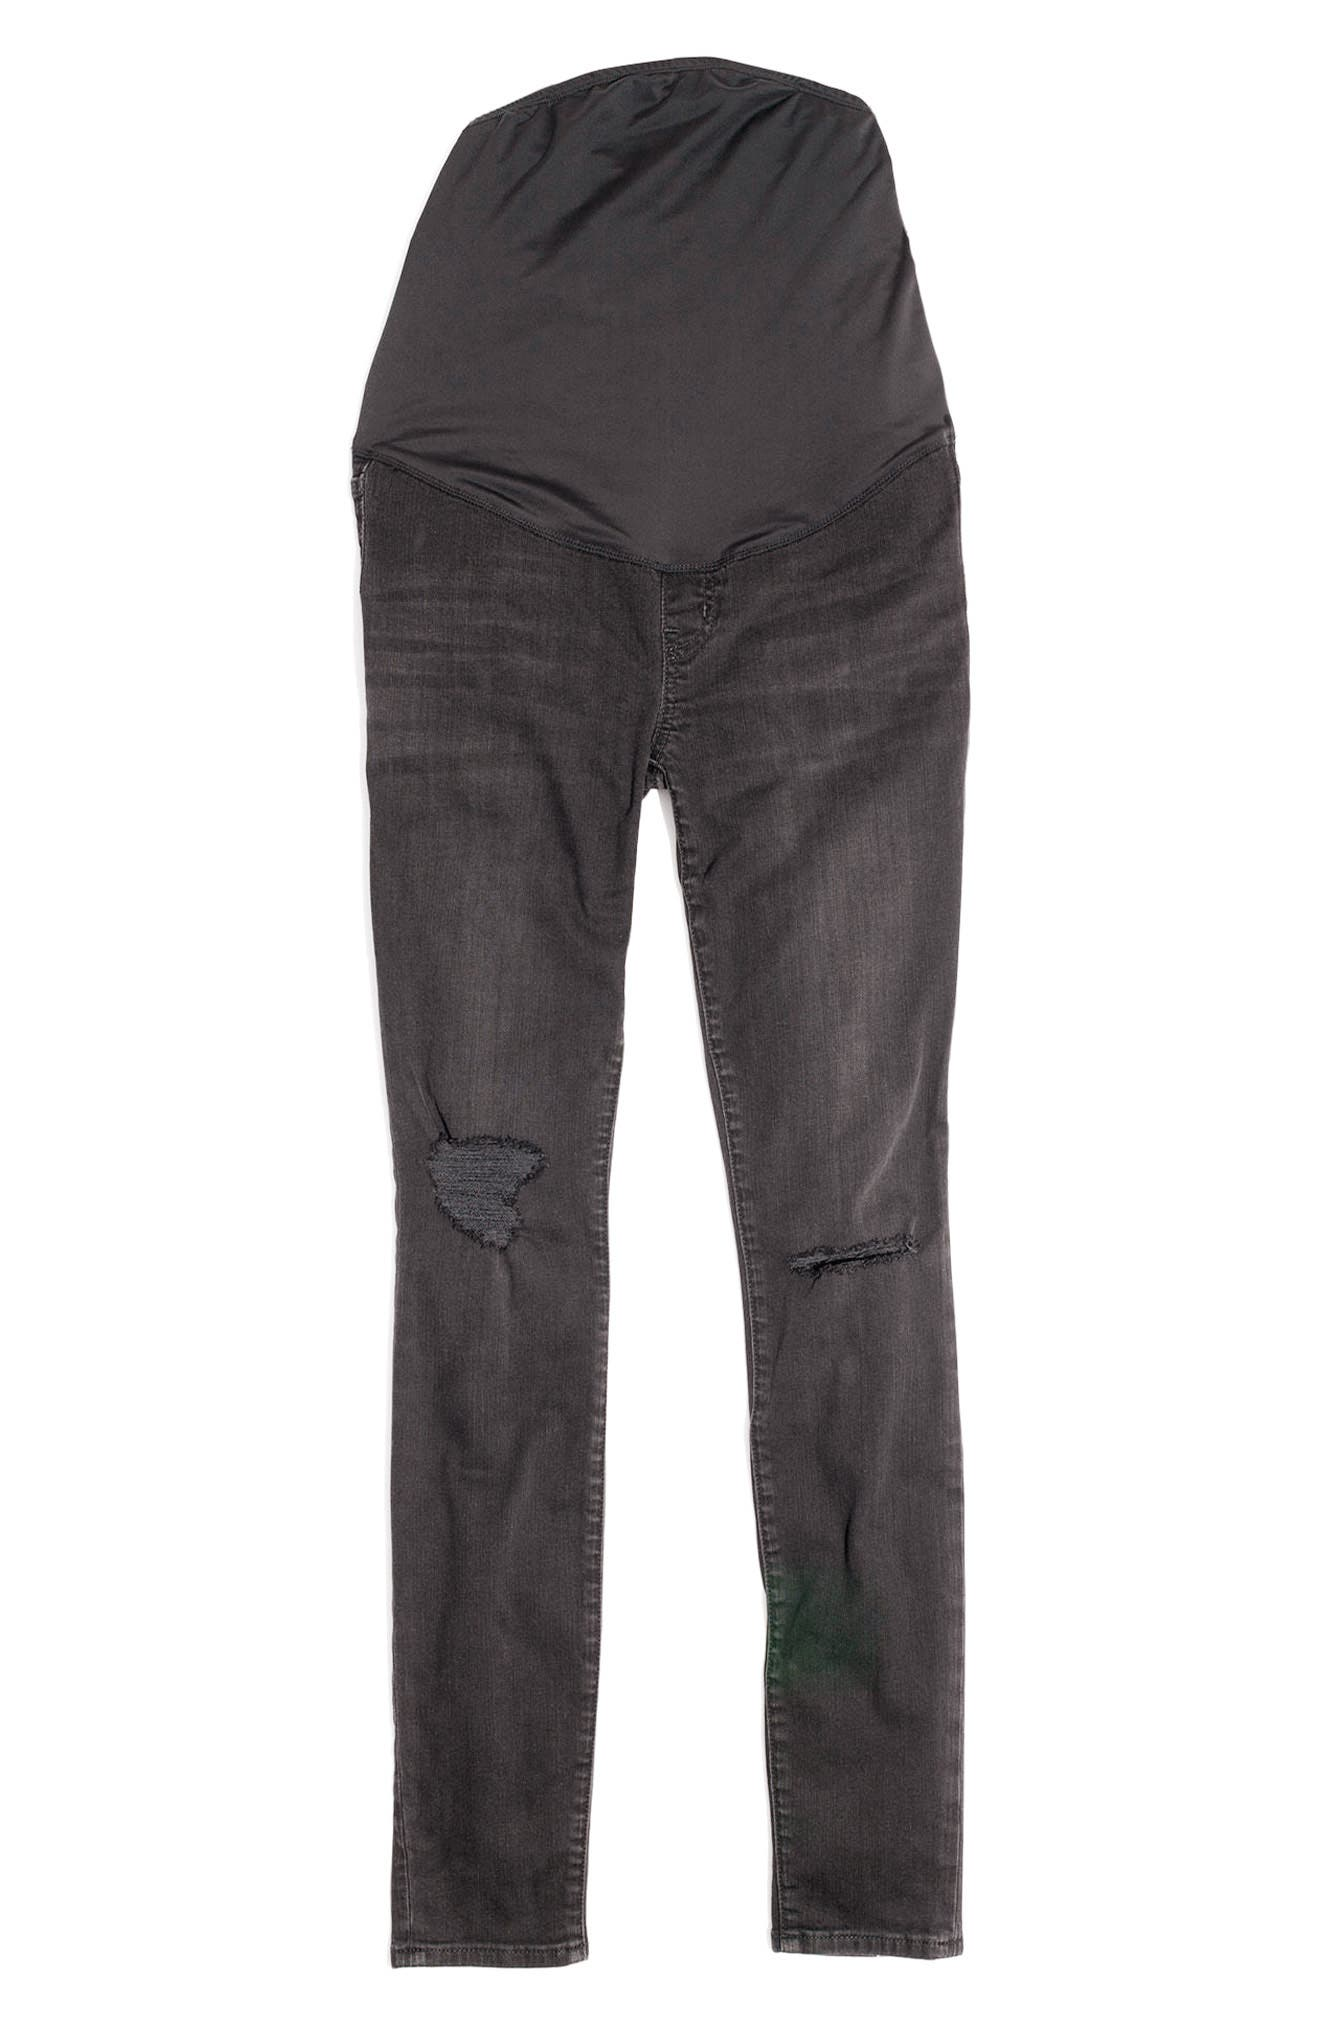 Maternity Skinny Jeans,                             Alternate thumbnail 6, color,                             009